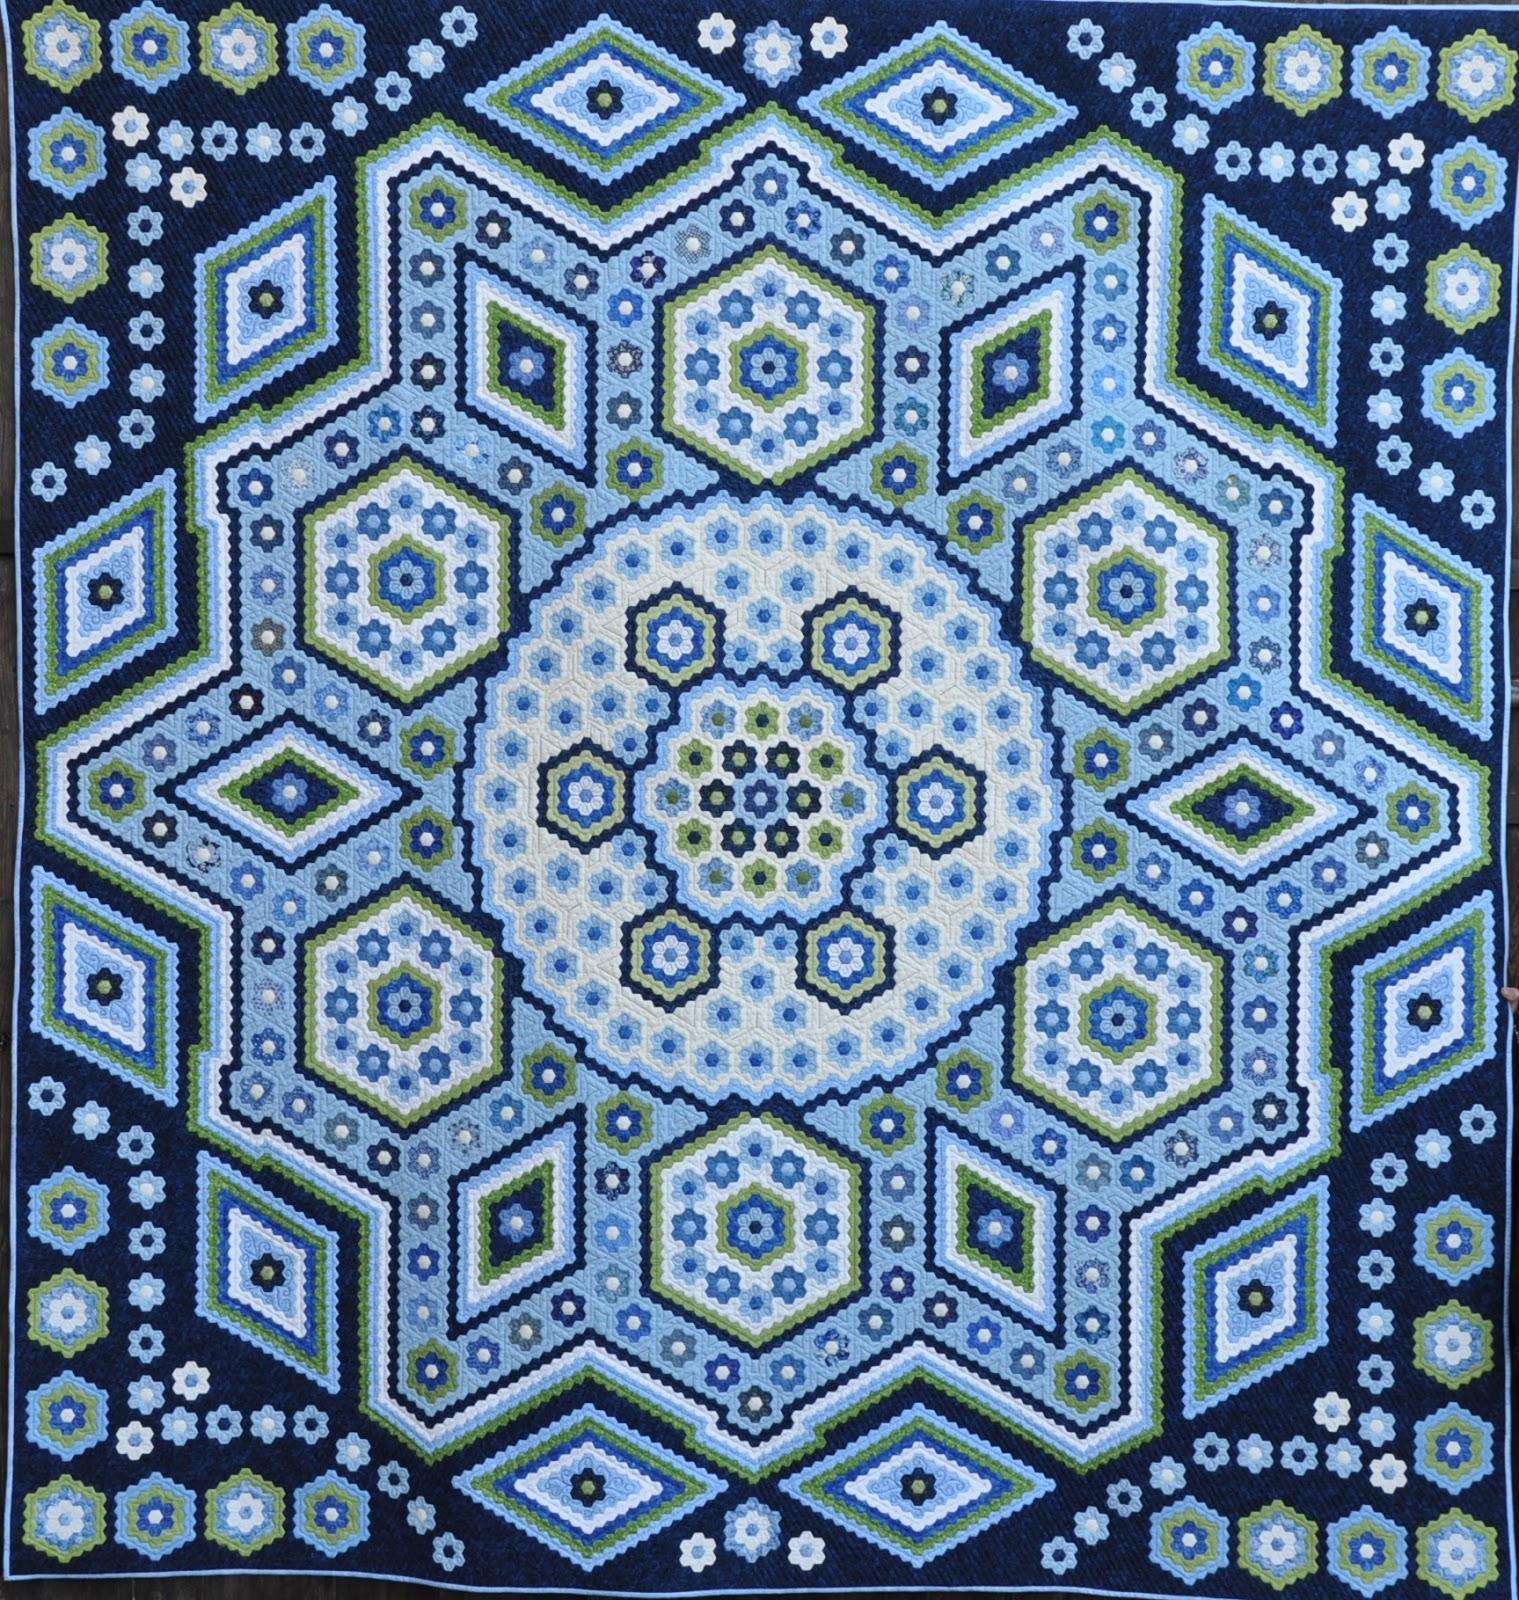 Quilting Templates Hexagon : The Vignette Hexagon Quilt